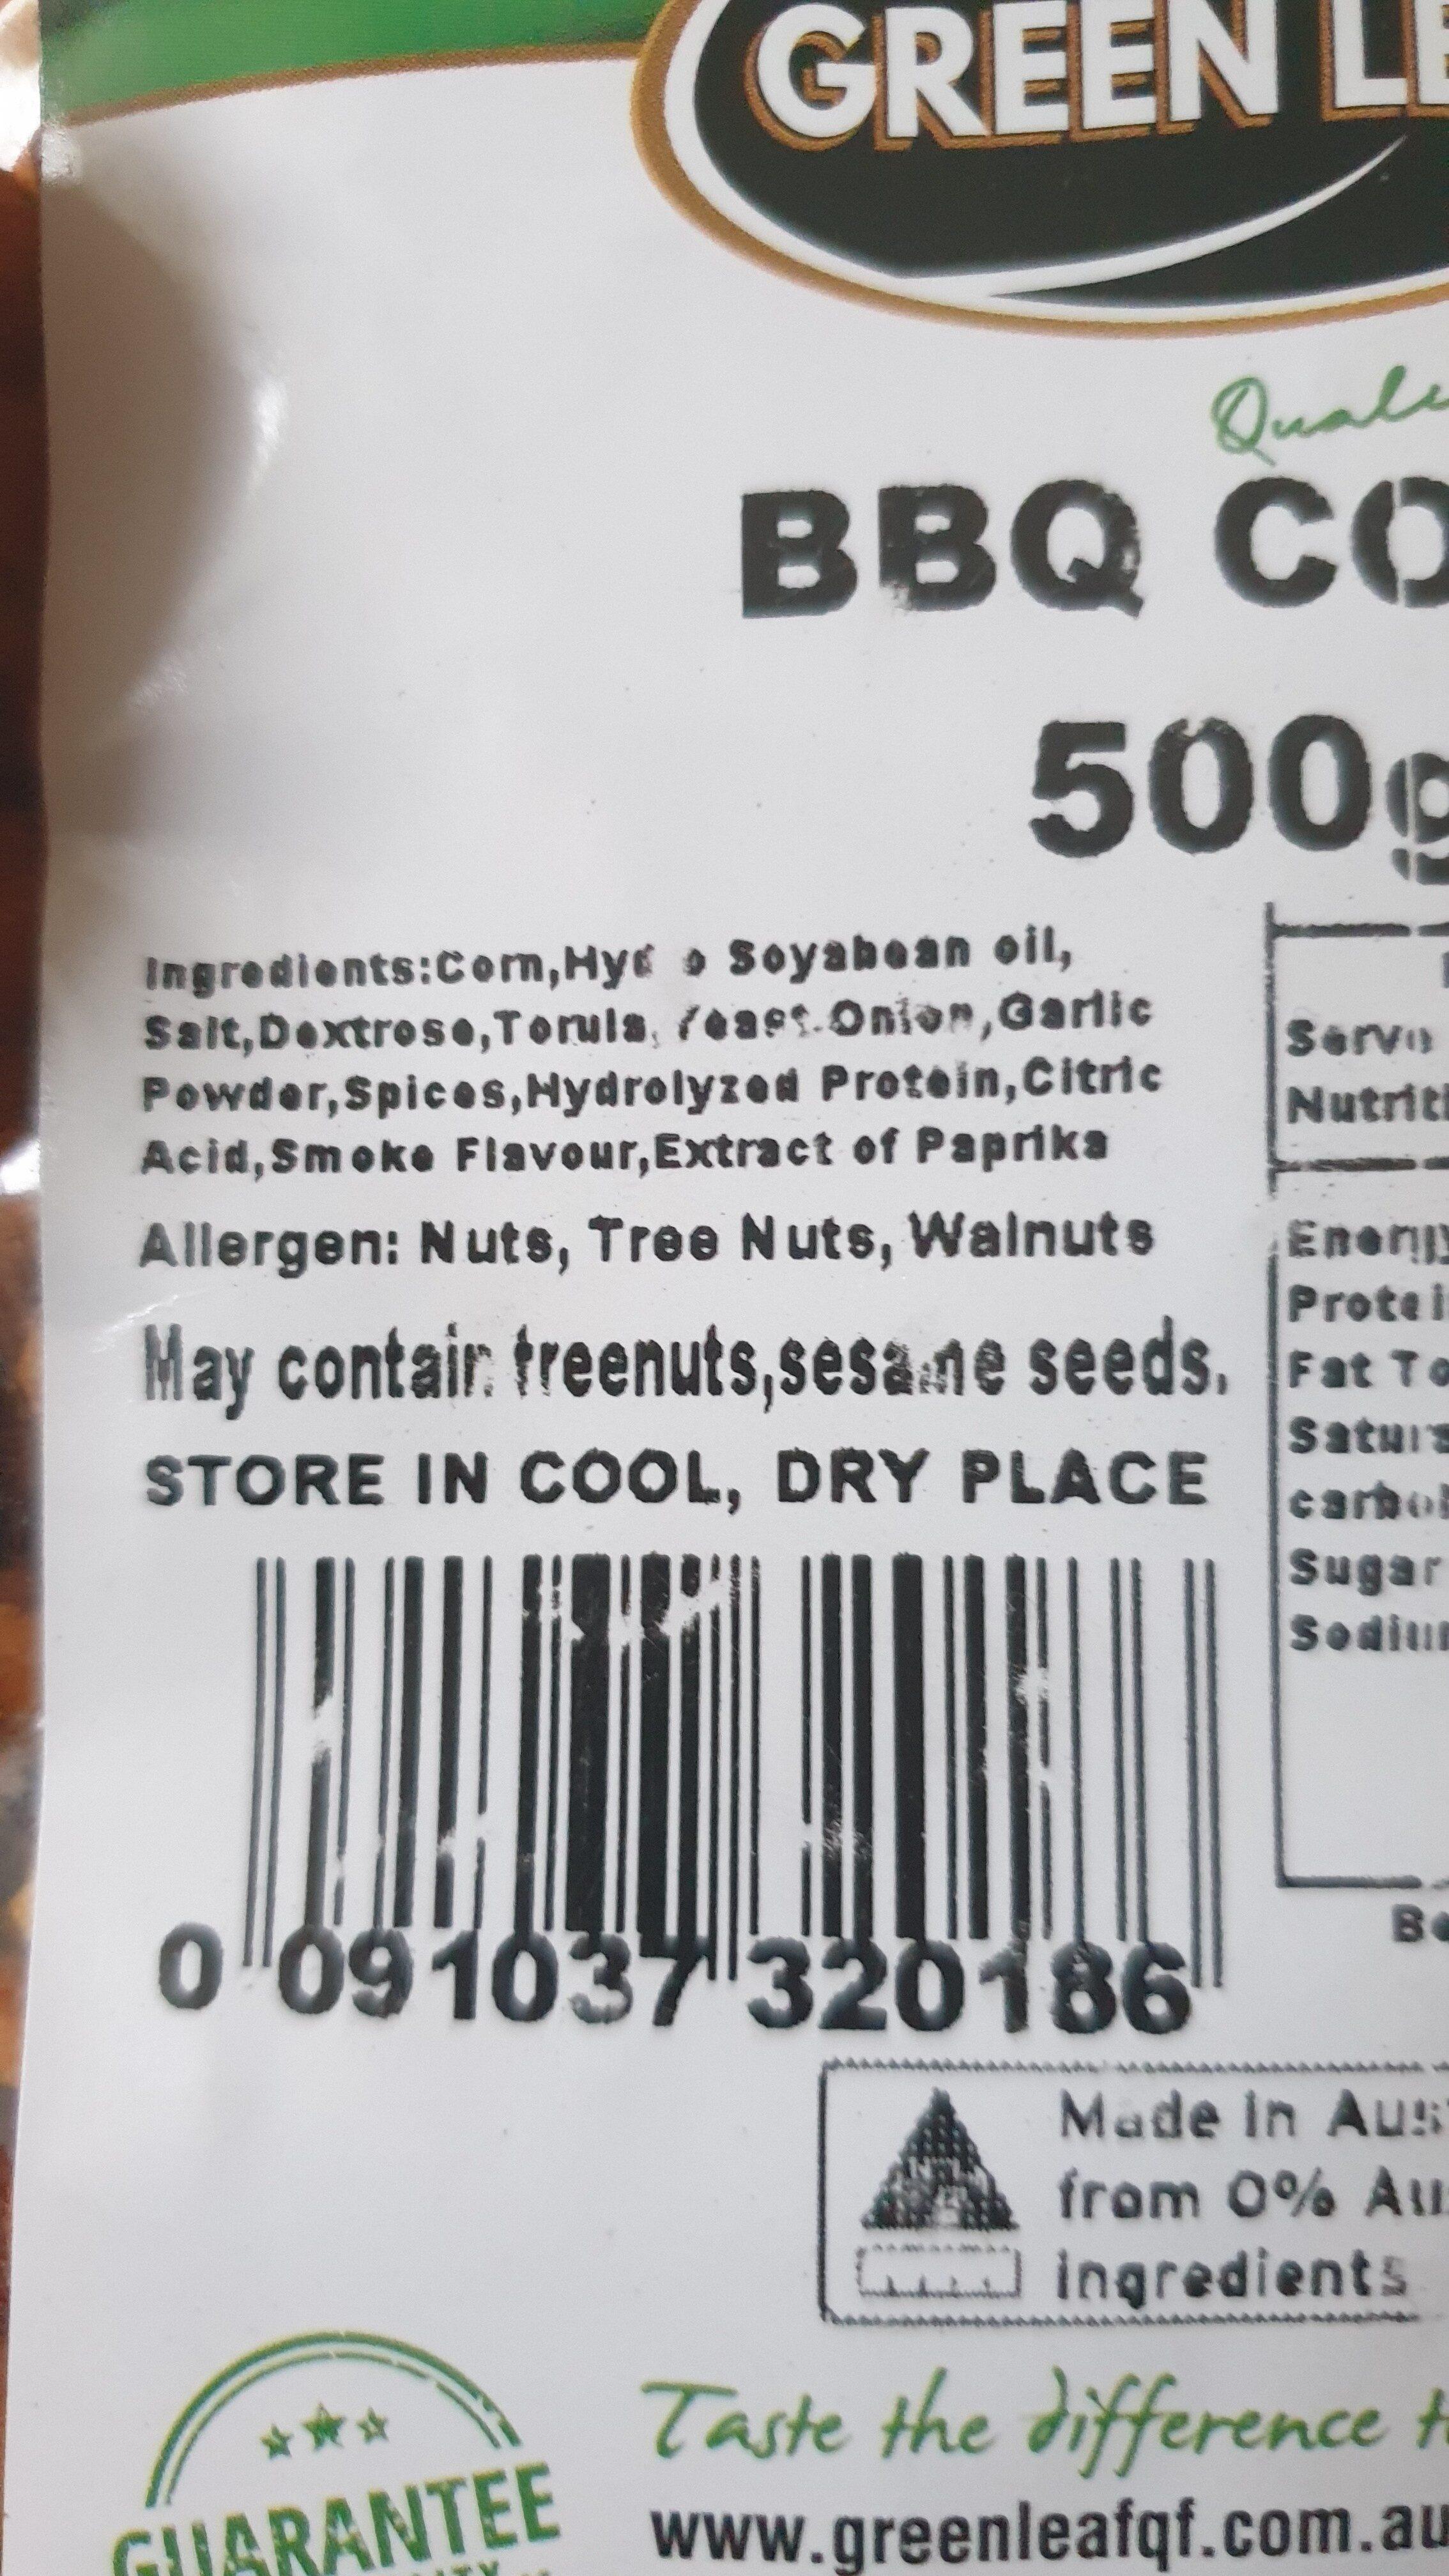 BBQ Corn - Ingrédients - en